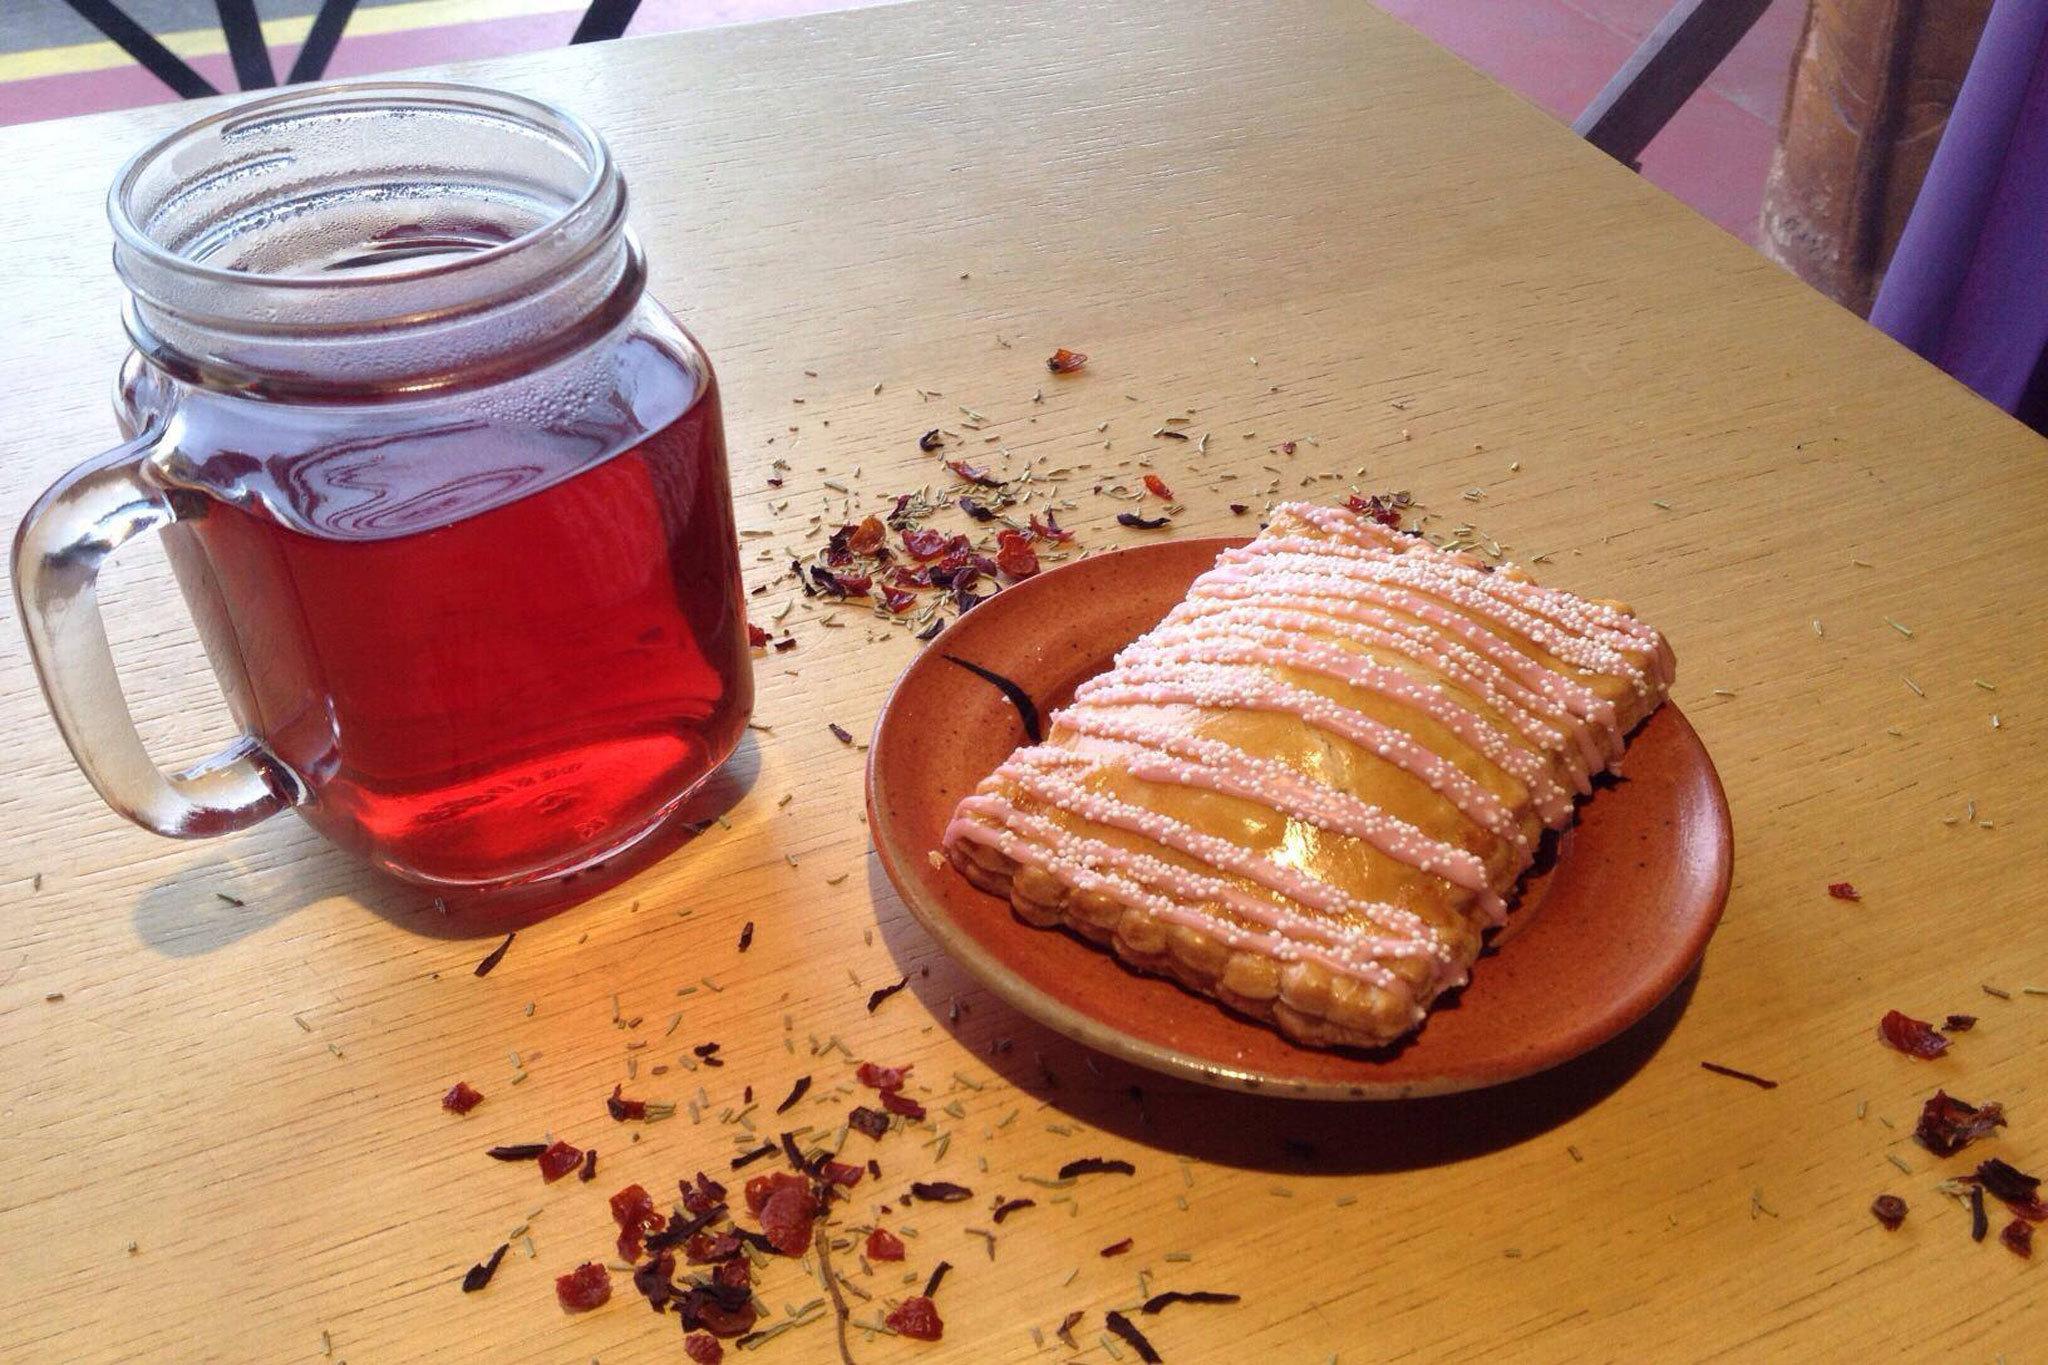 Moby's Coffee & Tea Co.